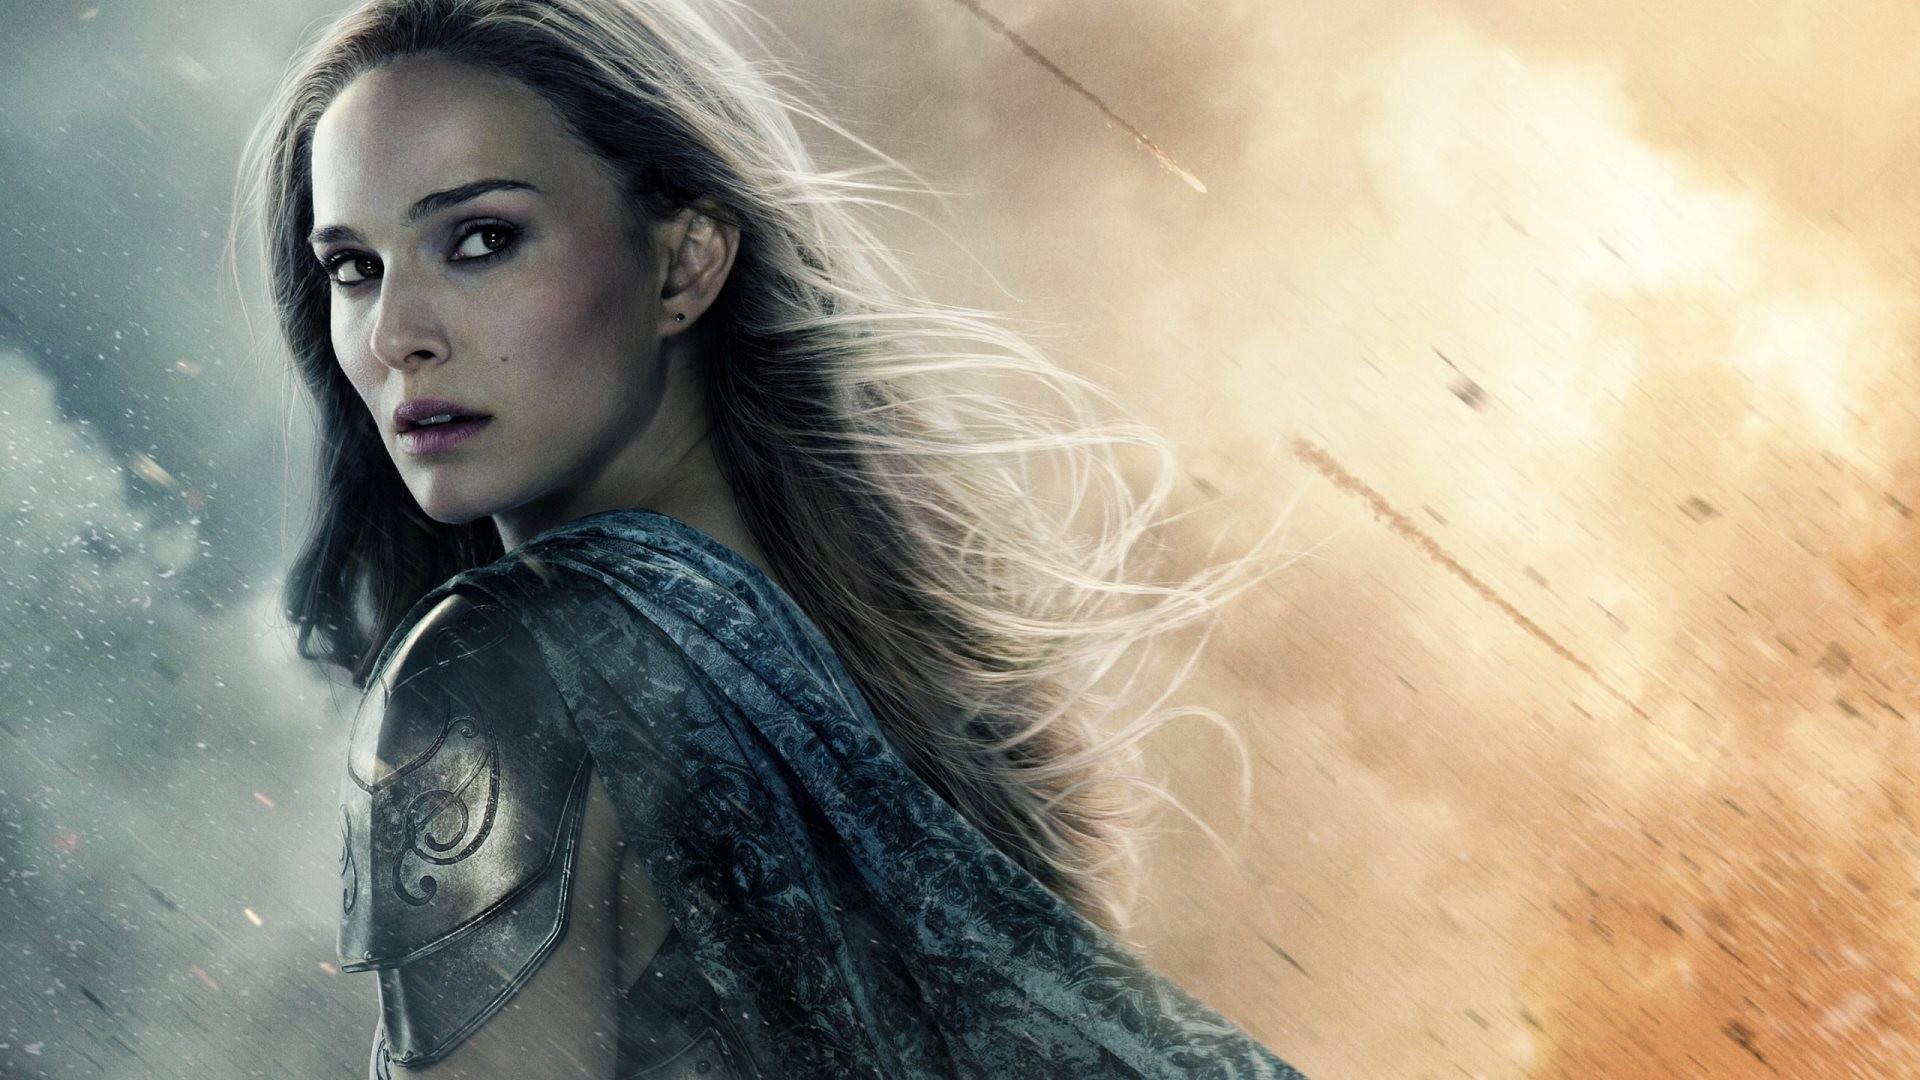 Wallpaper : 1920x1080 Px, Natalie Portman, Thor 2 The Dark